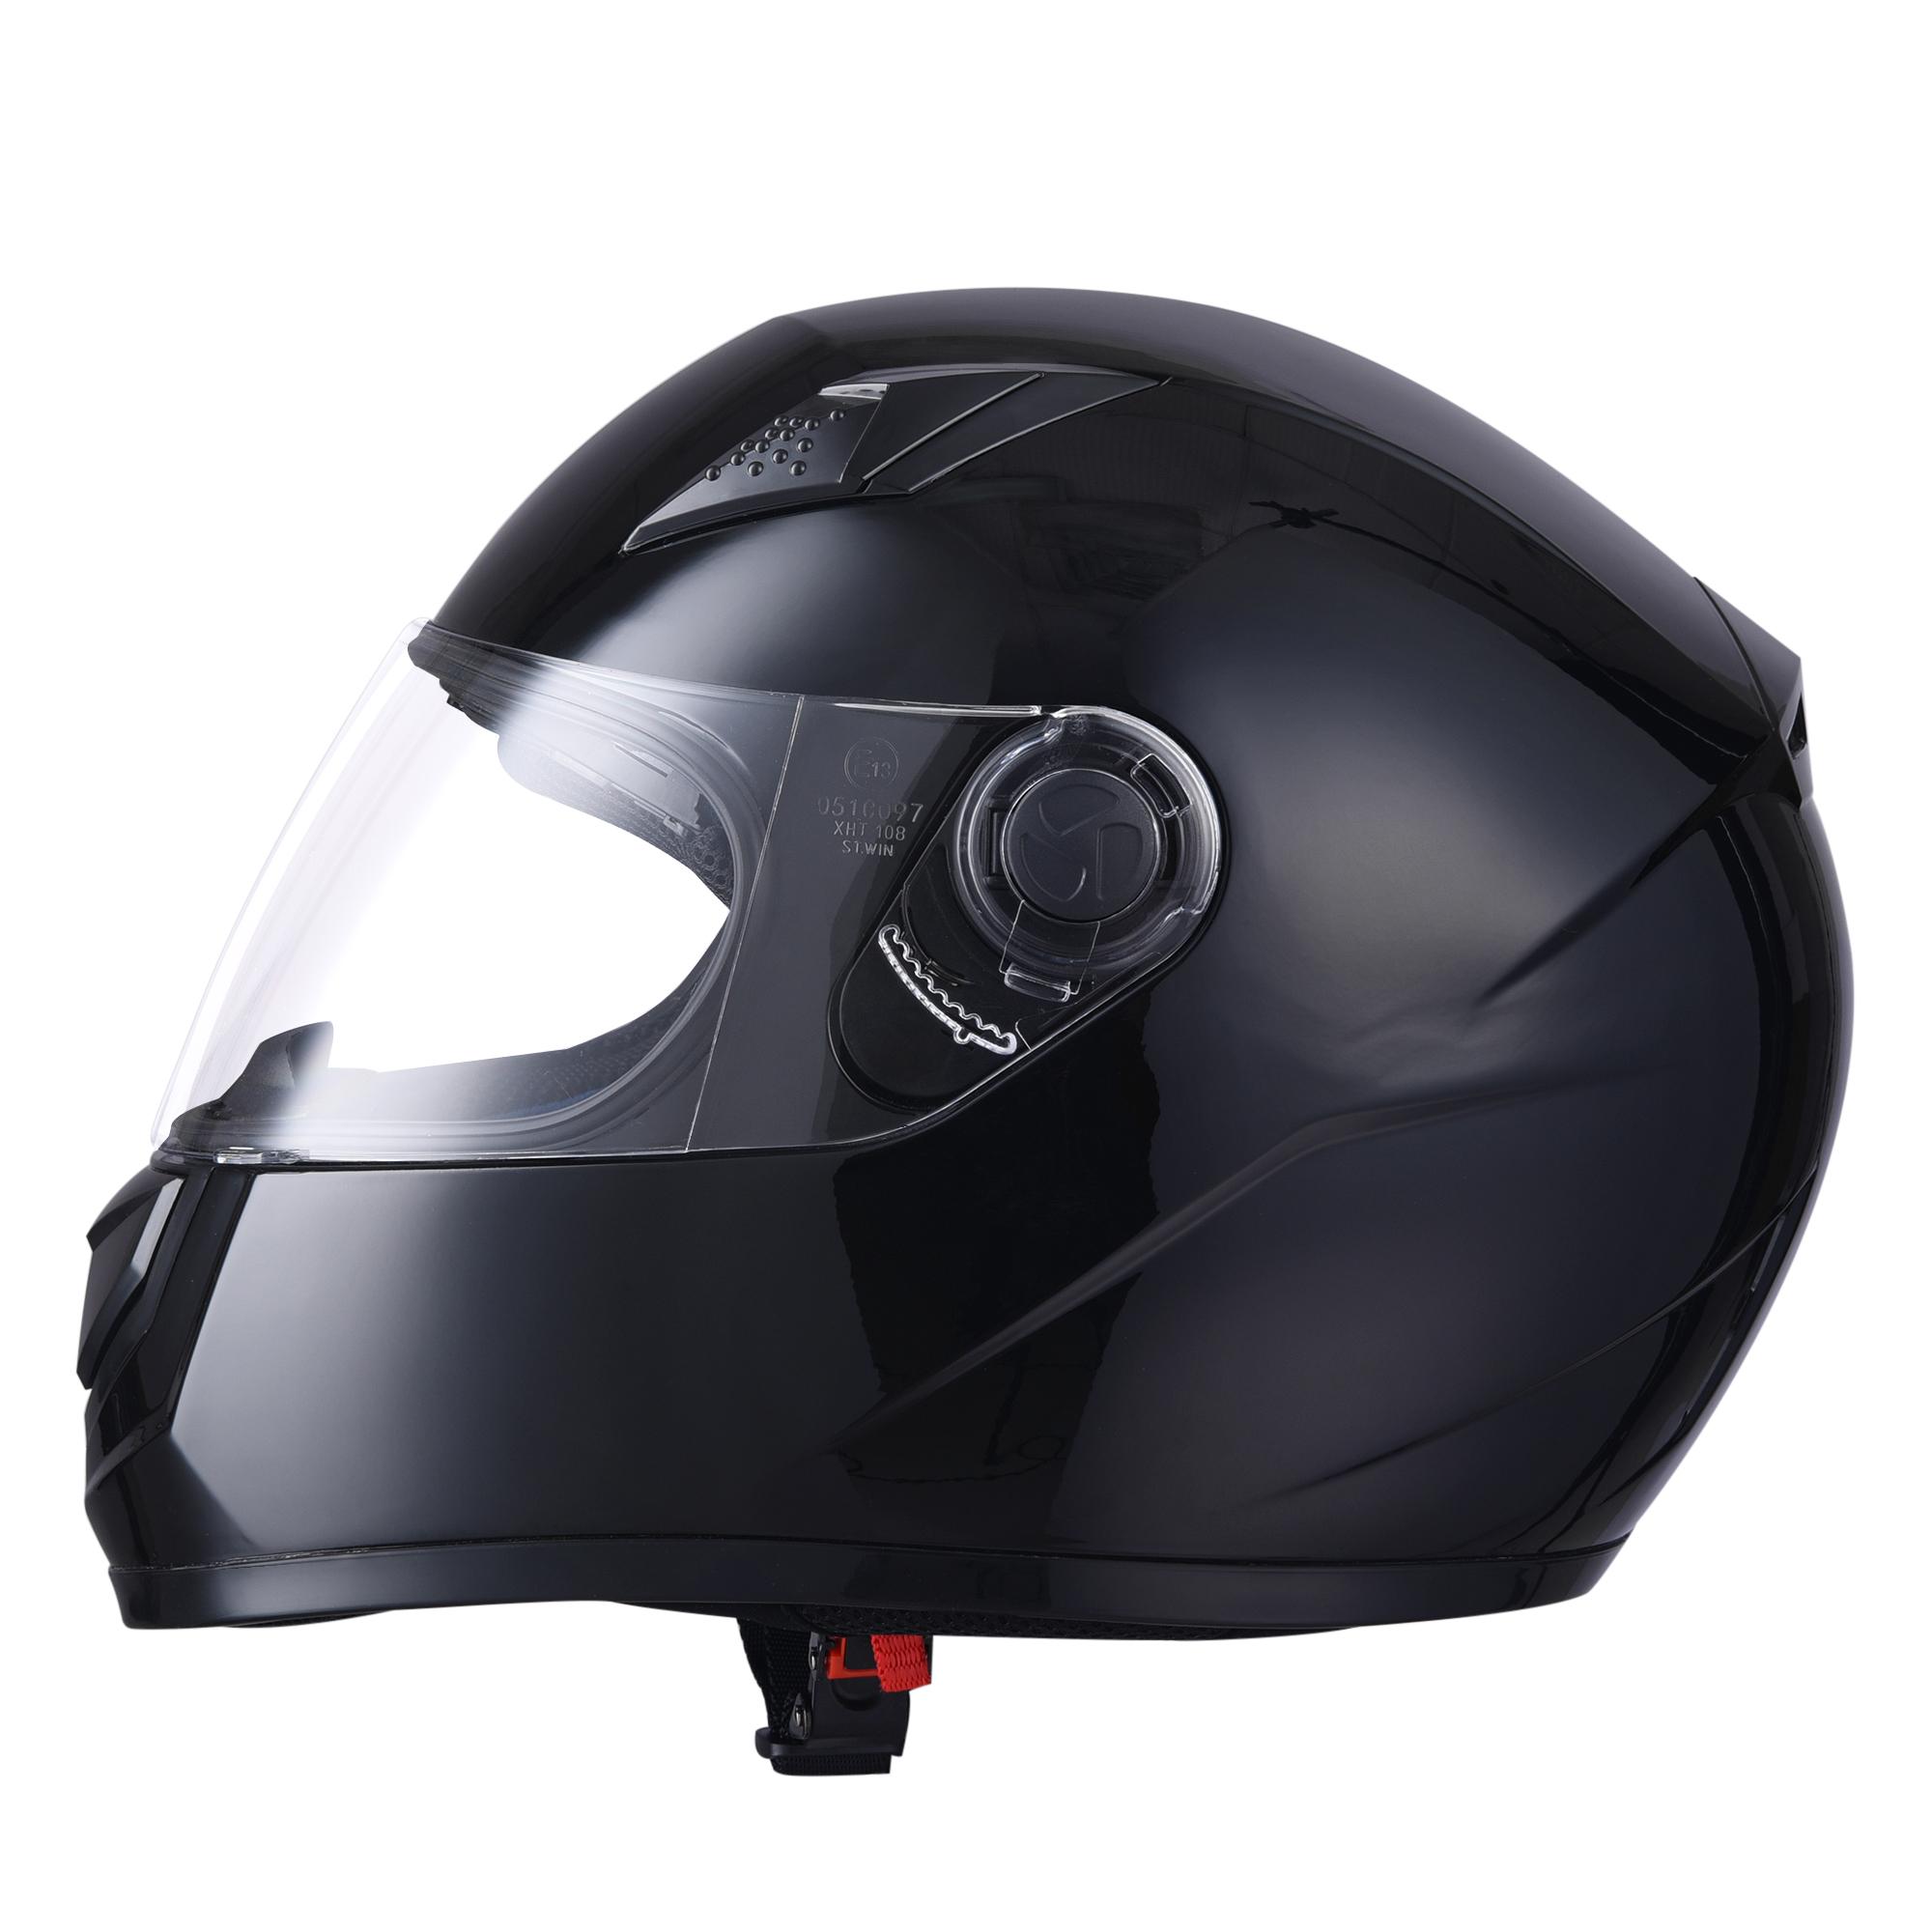 miniature 51 - AHR K12 Full Face Motorcycle Helmet DOT Air Vents Clear Visor Racing S M L XL